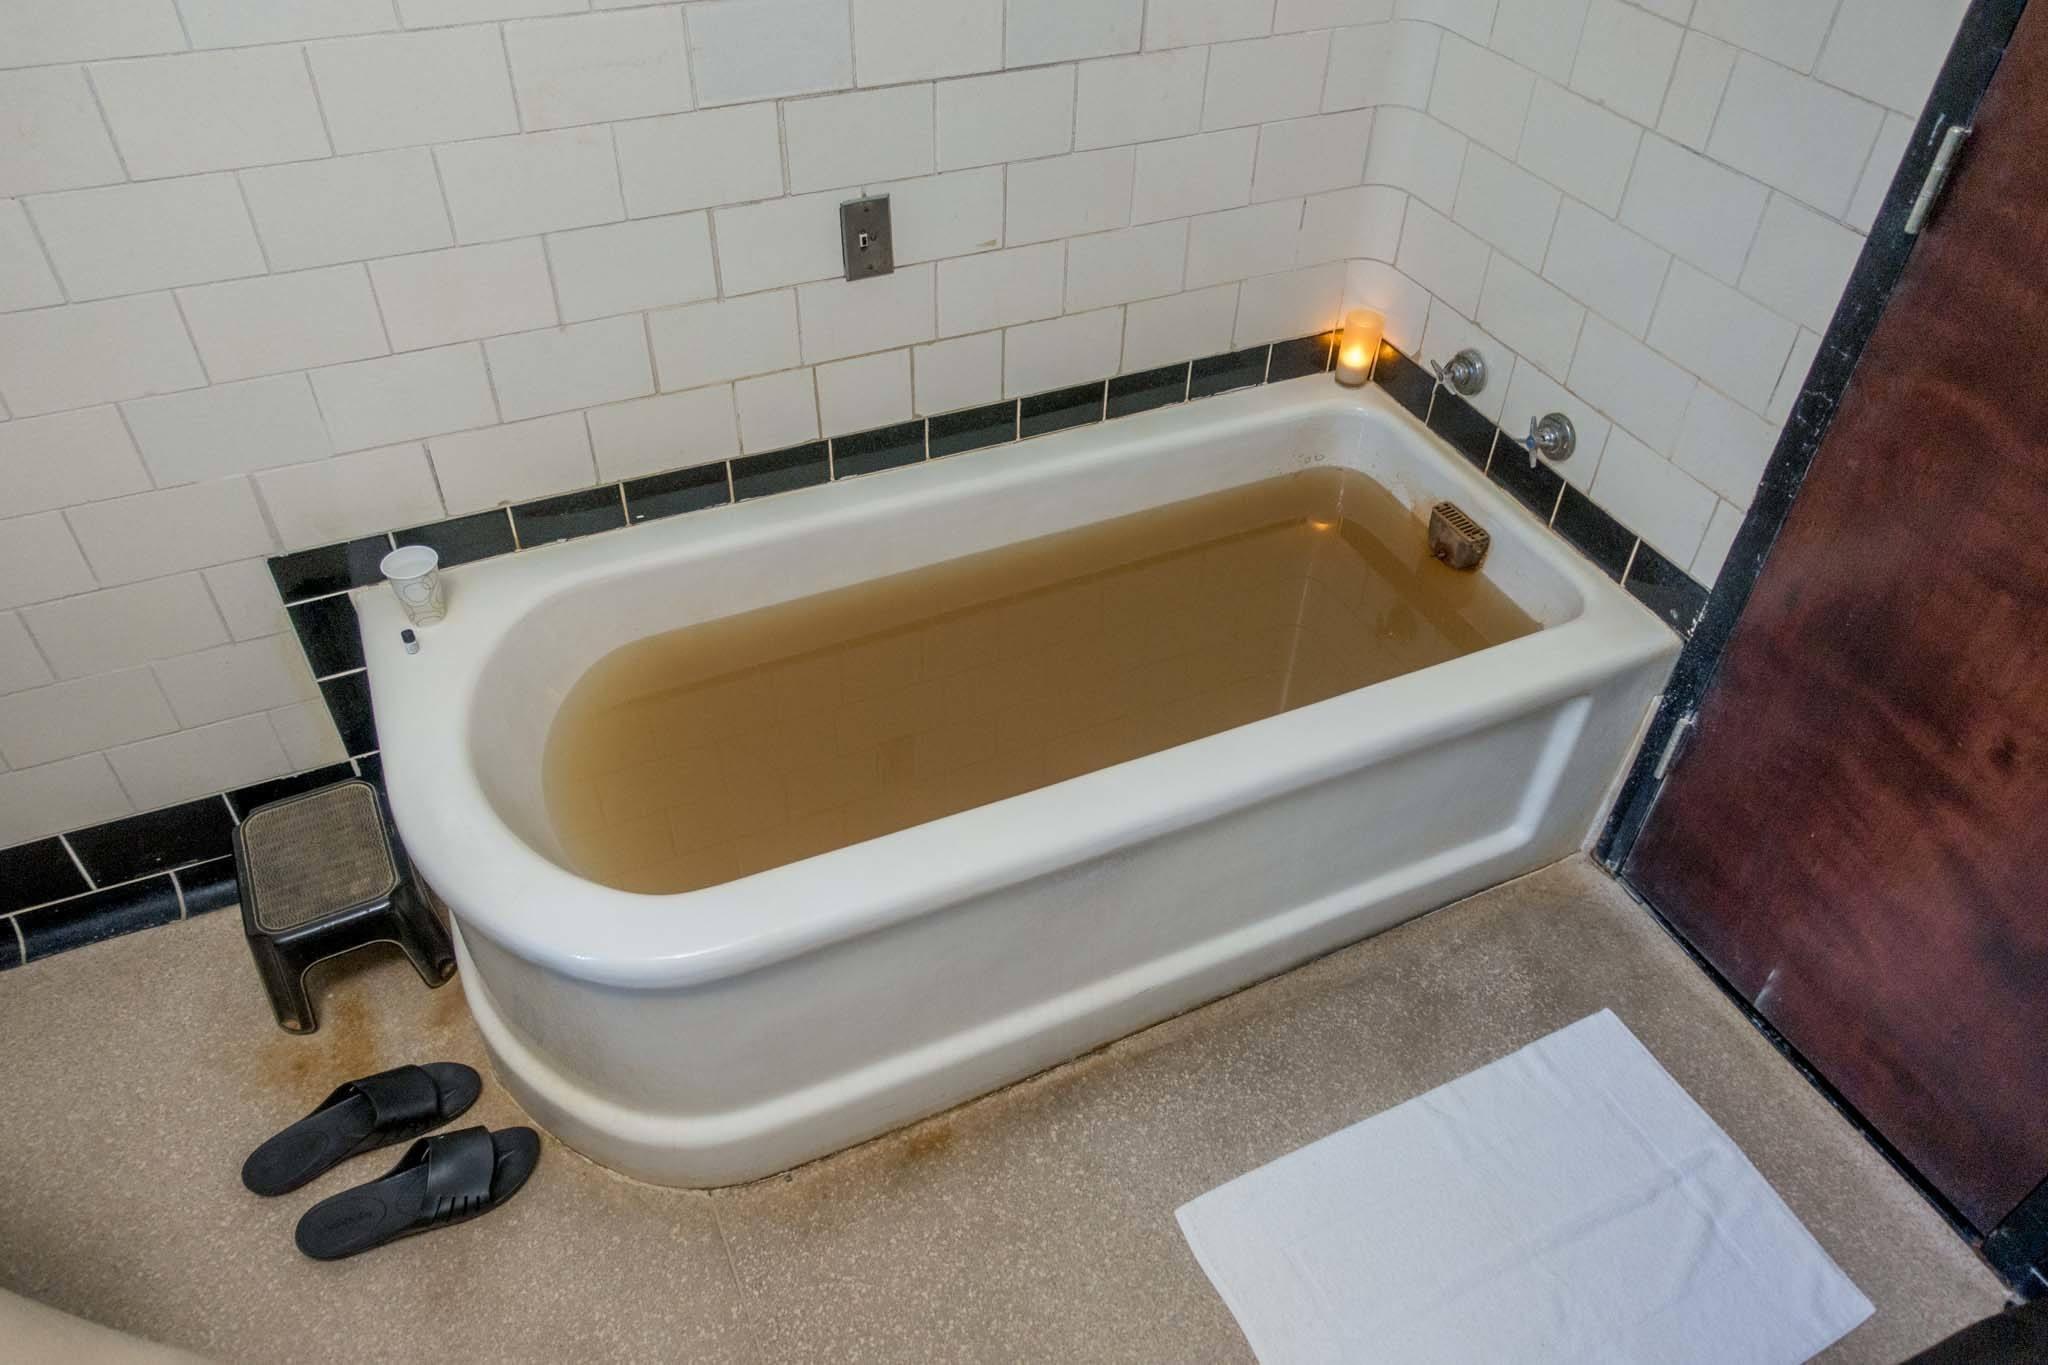 Bathtub with yellow